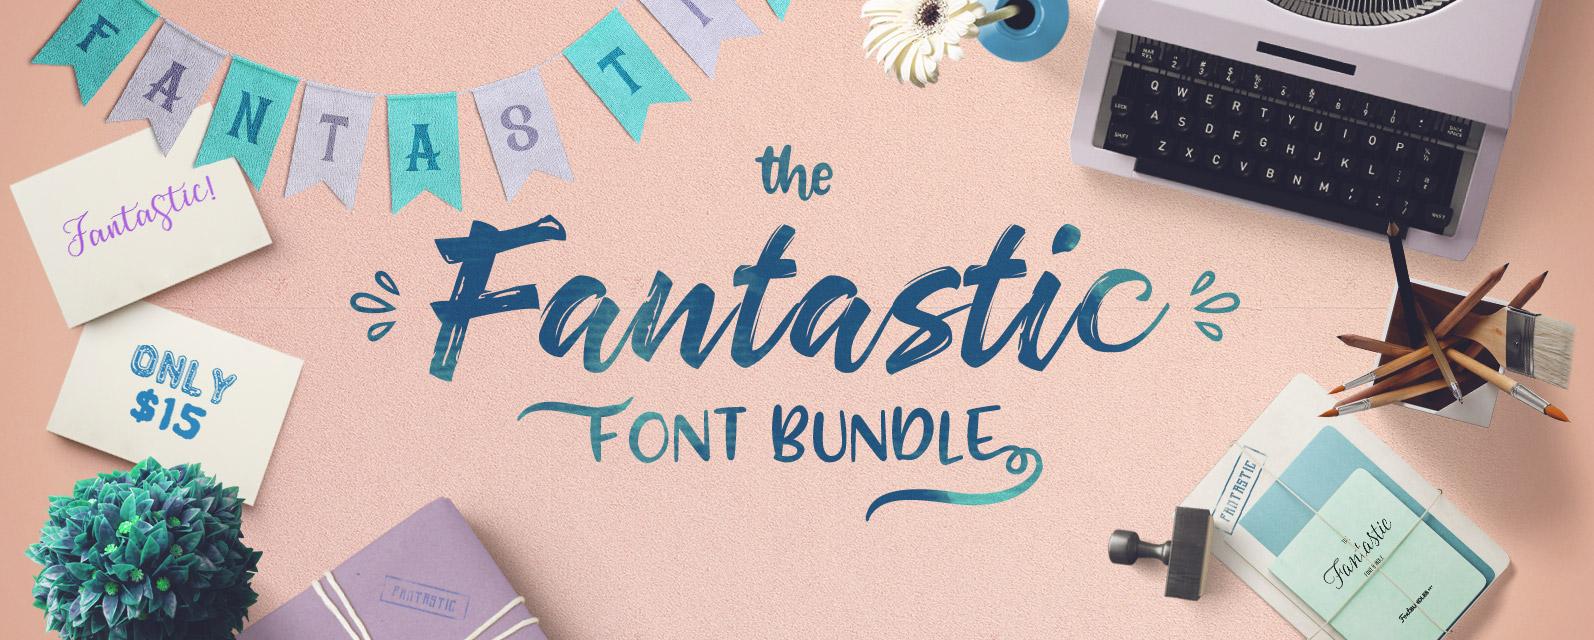 The Fantastic font bundle